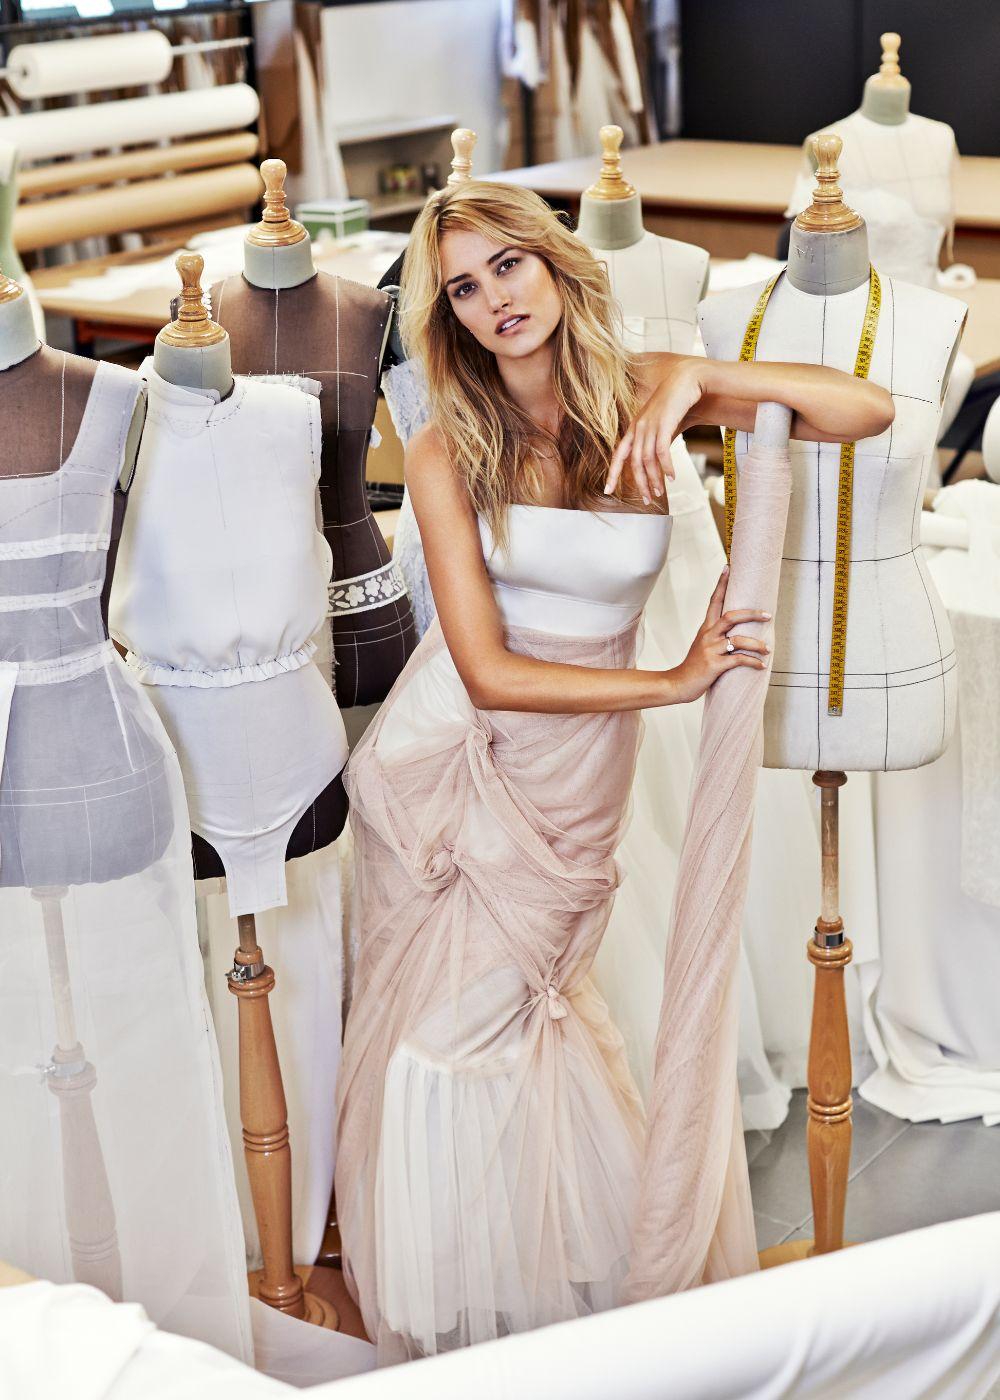 Puedes empezar a buscar vestido con 10 meses de antelalción respecto a la fecha de tu boda.